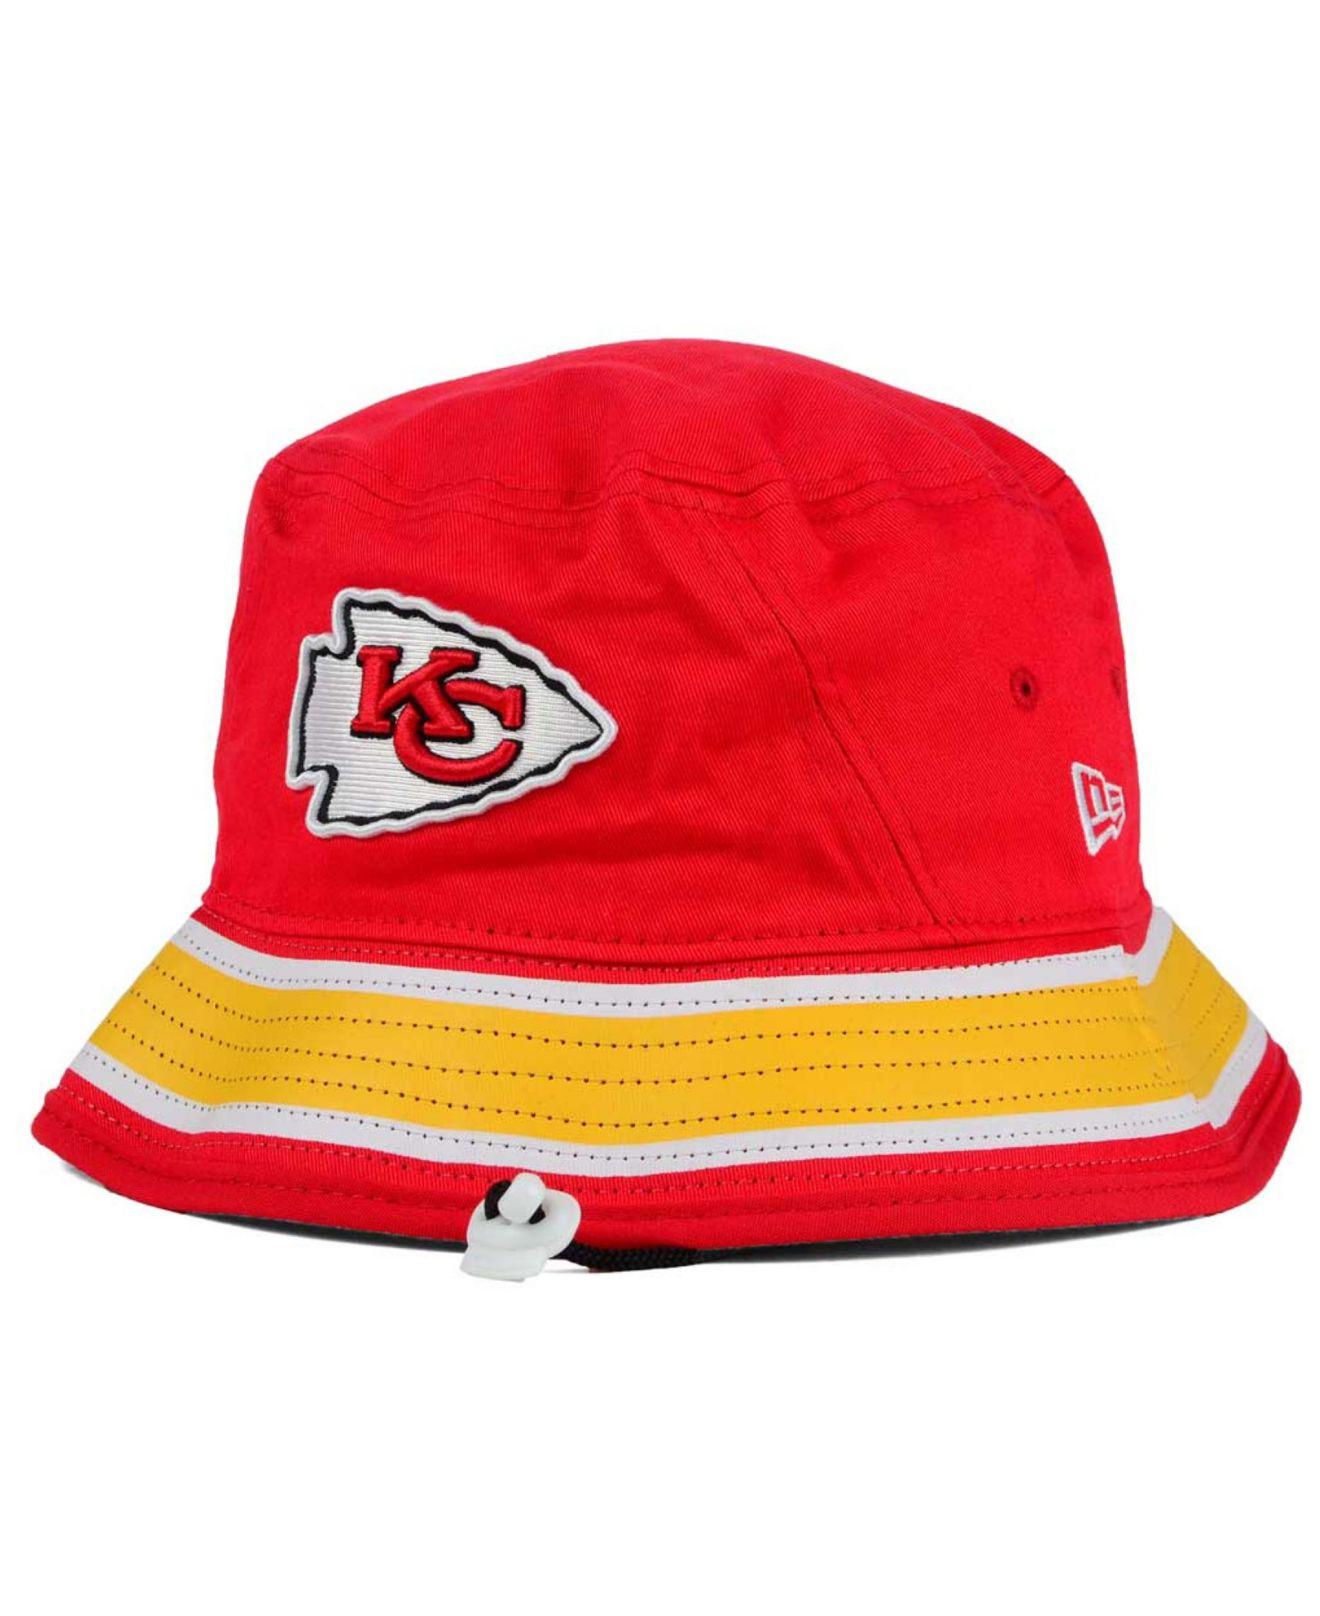 c87f1a0b9 purchase kansas city chiefs bucket hat bc3fa 25e62